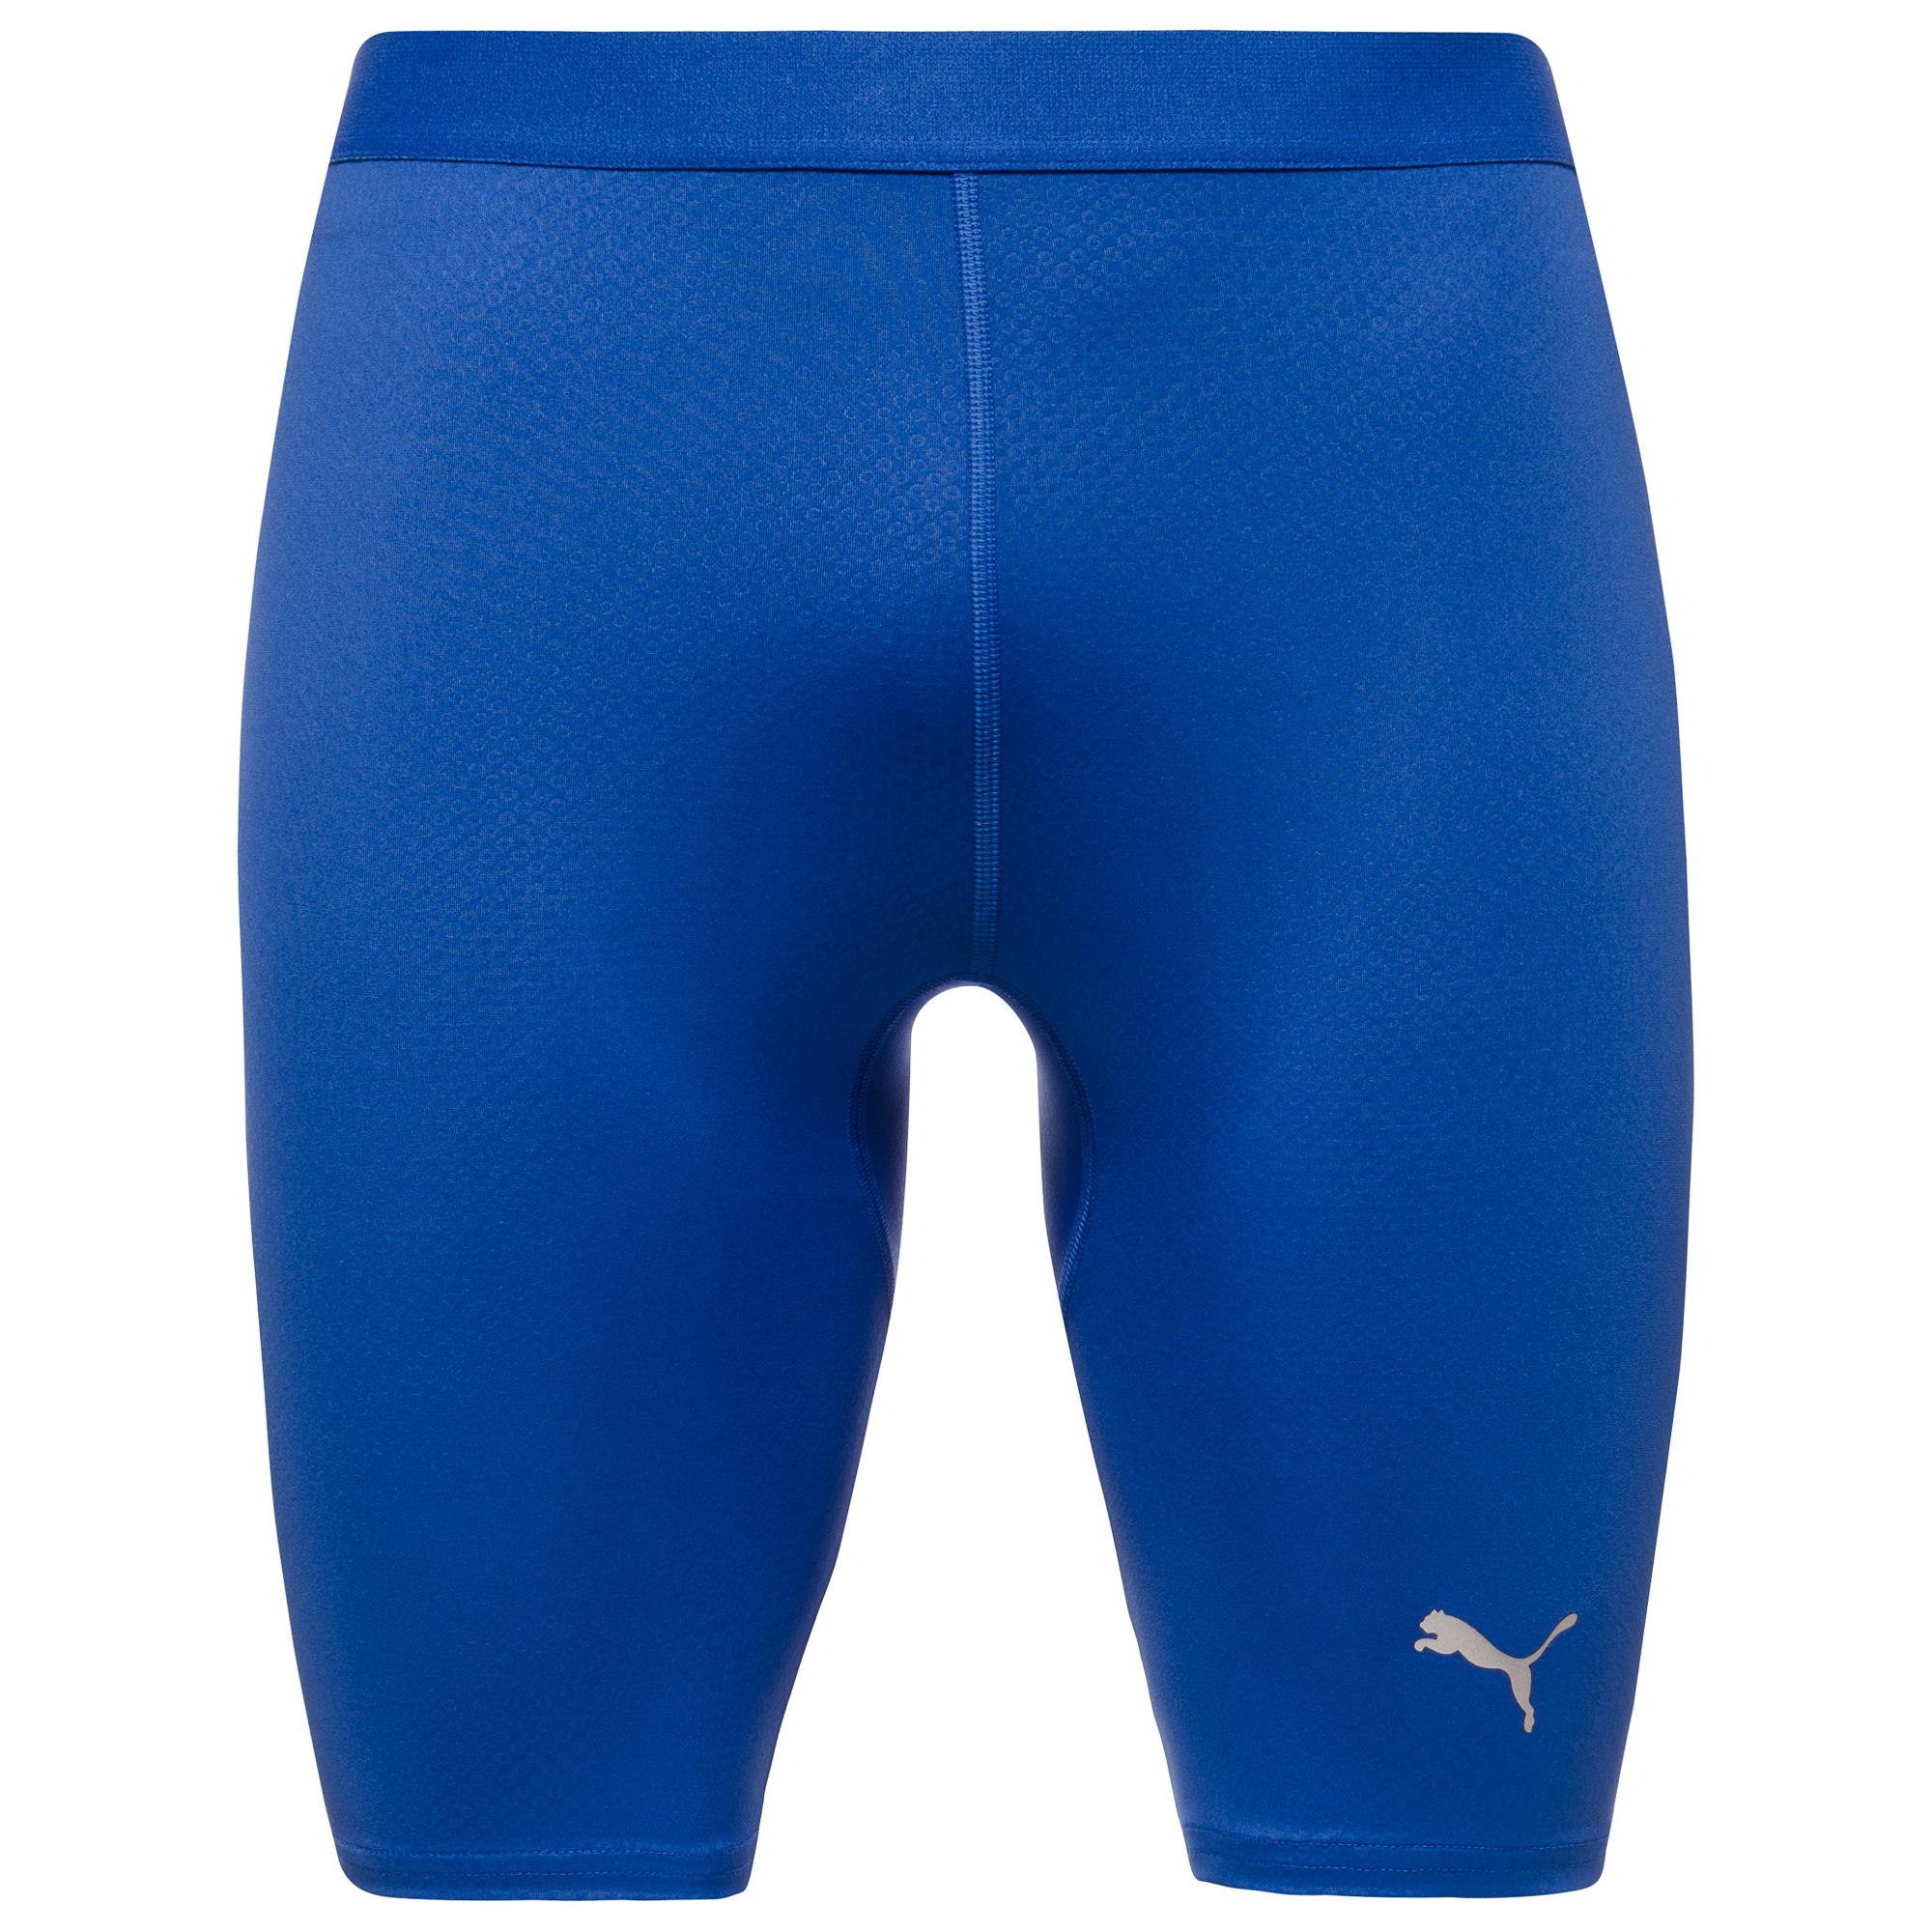 Puma Baselayer Core Värmebyxor Blå